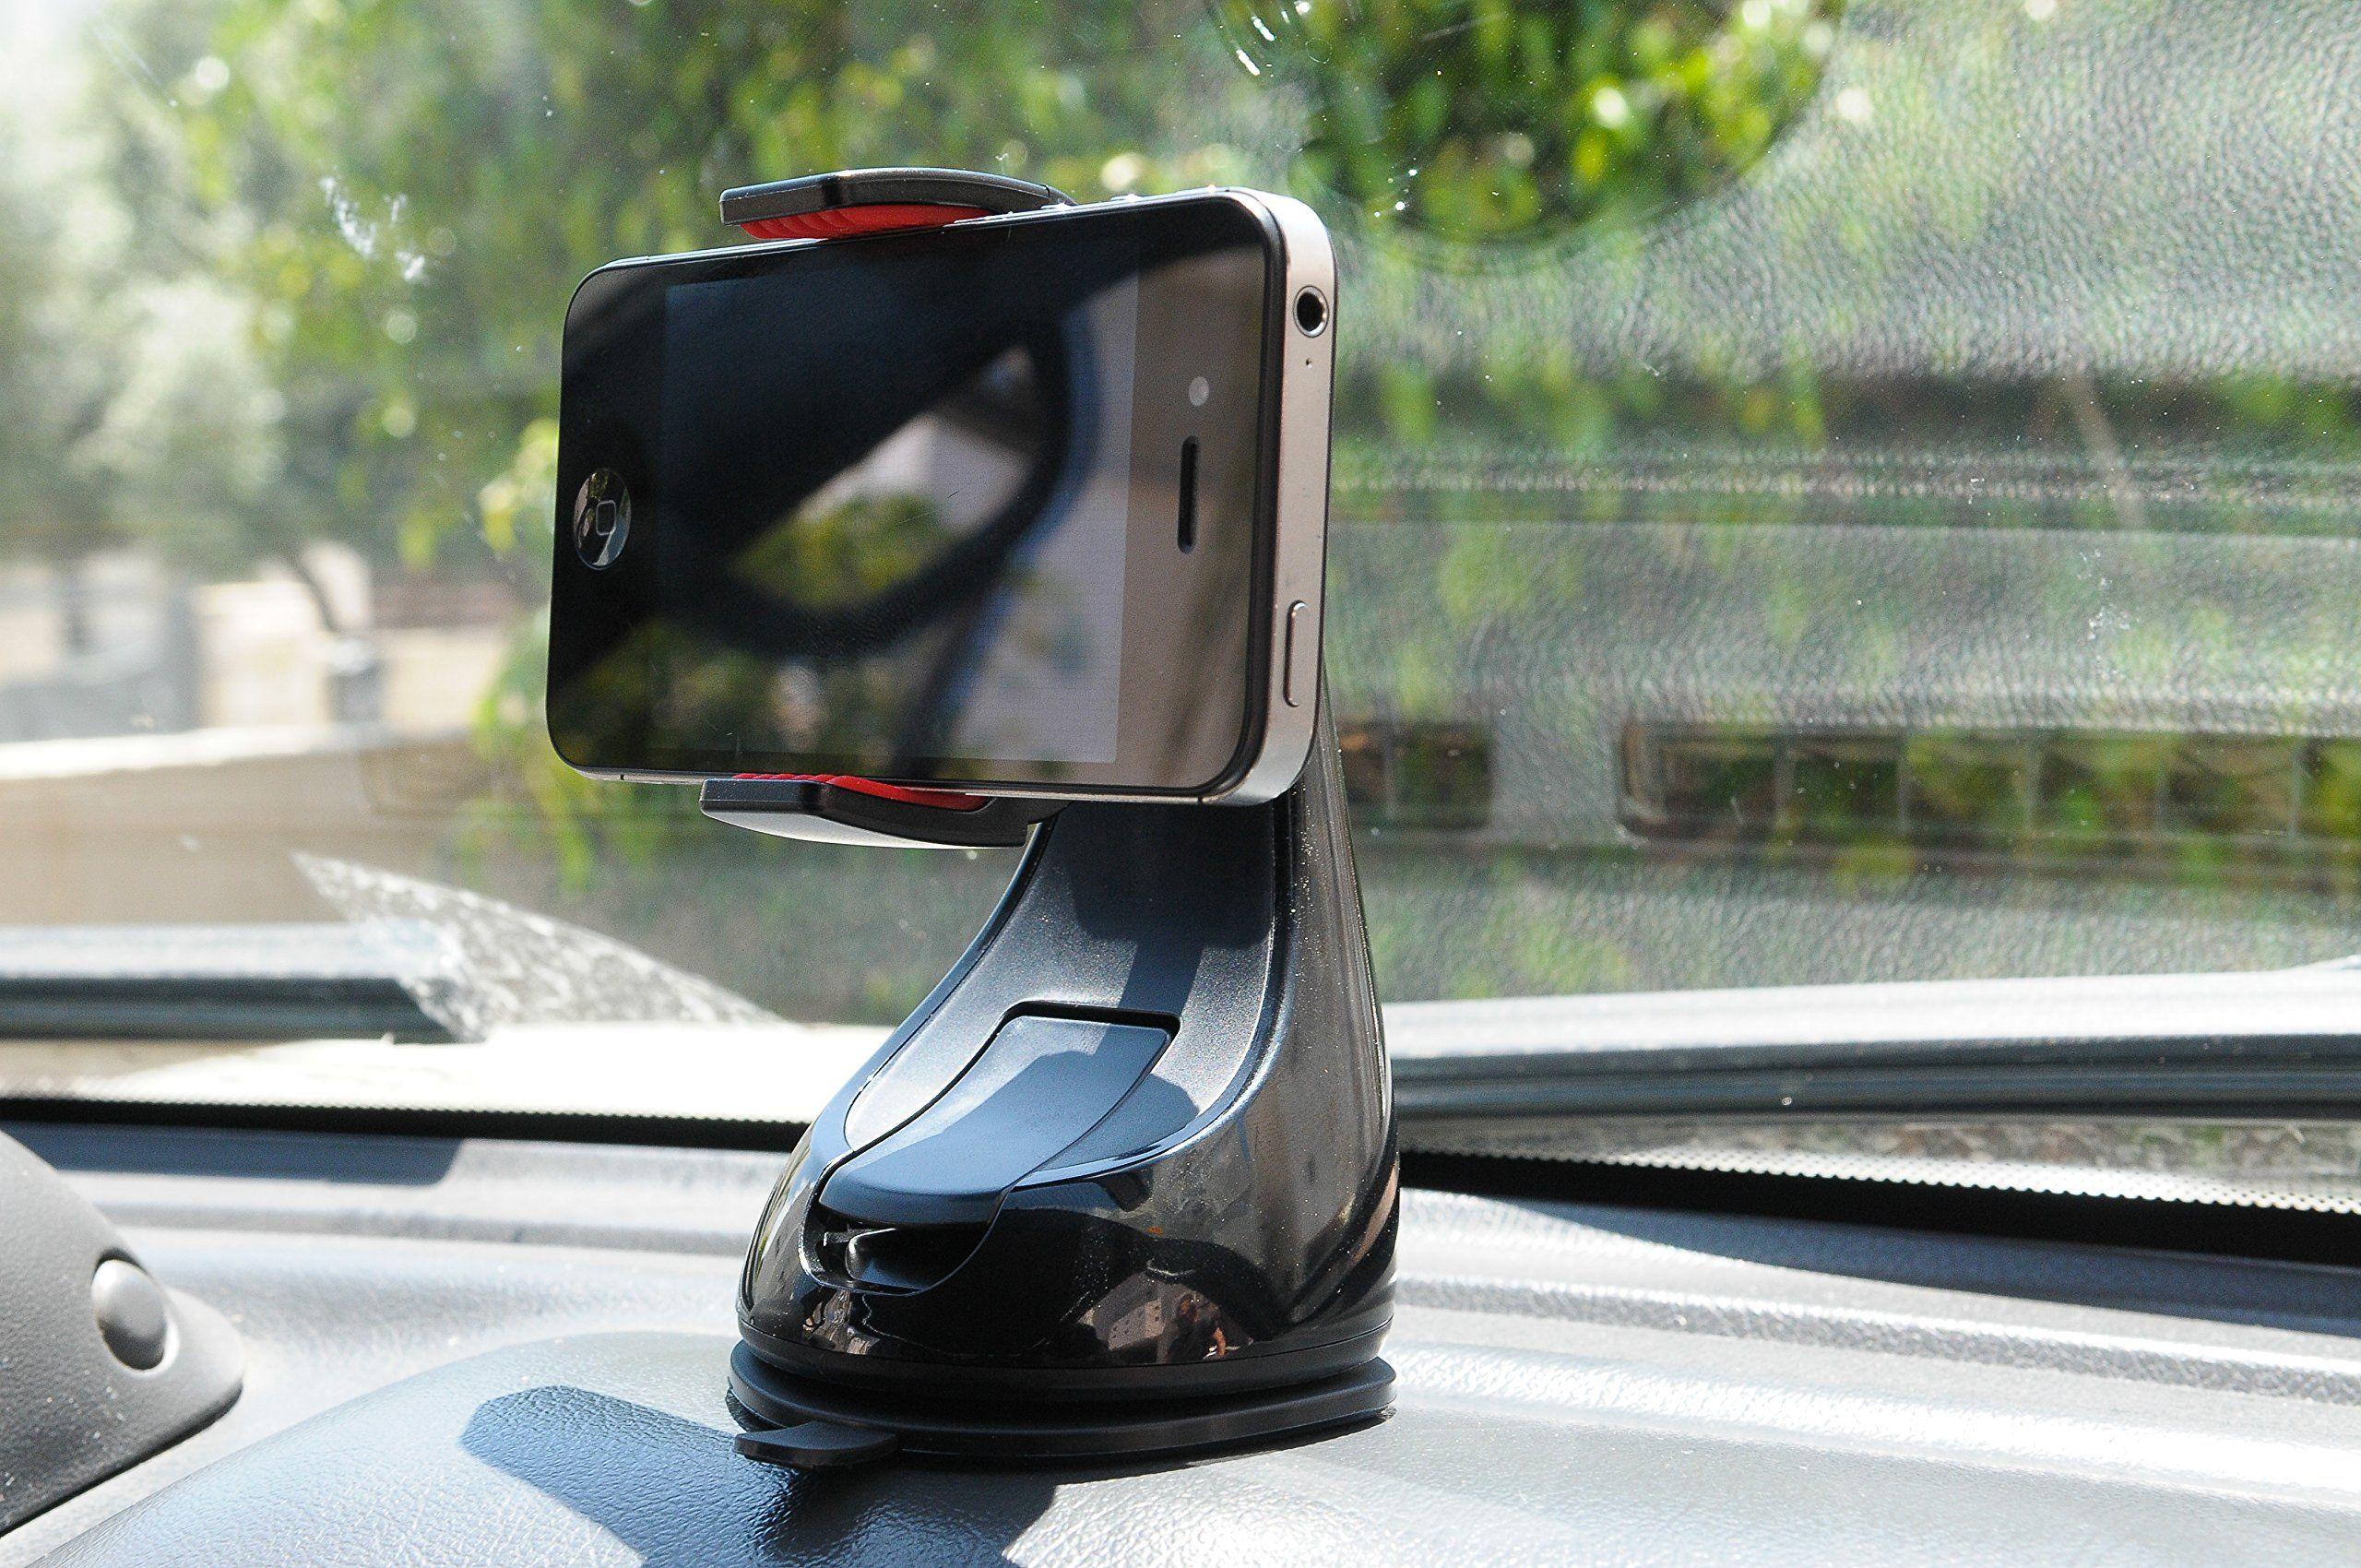 3366162c43ee83624eee22c4fc59210f Exciting Blackberry Z10 Bmw Snap In Cars Trend